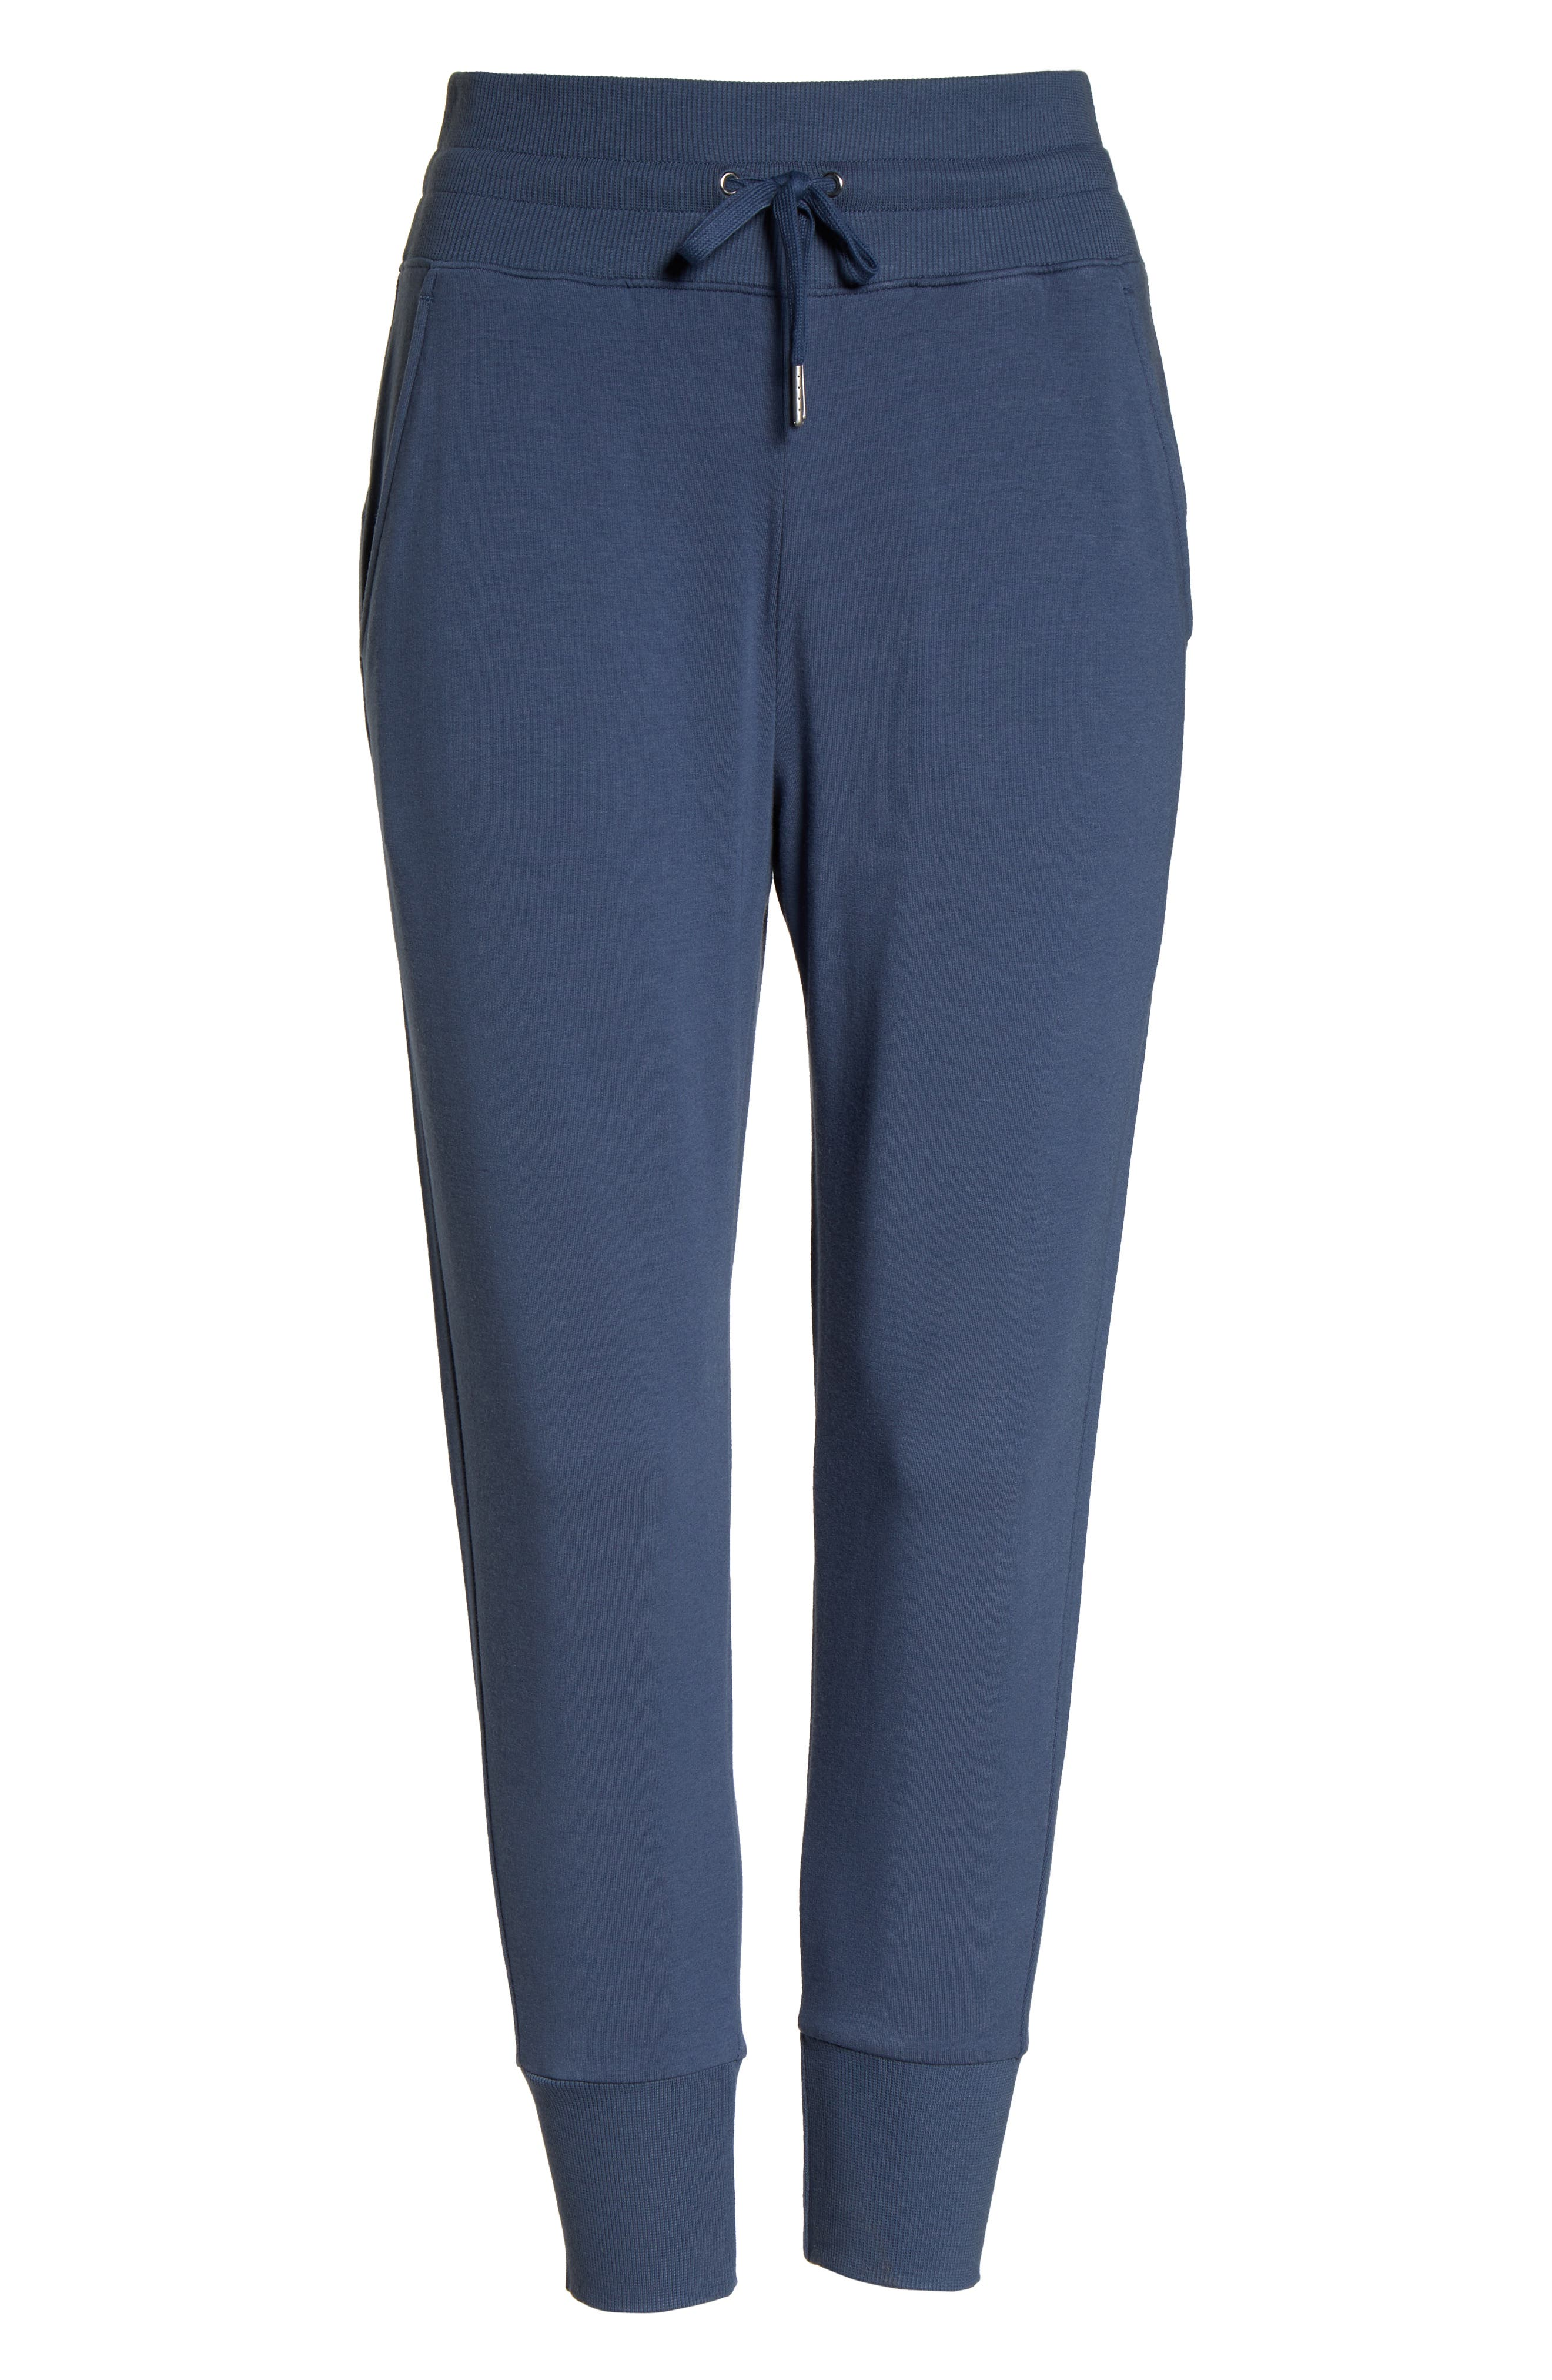 ZELLA, Repeat High Waist Crop Jogger Pants, Alternate thumbnail 7, color, BLUE VINTAGE